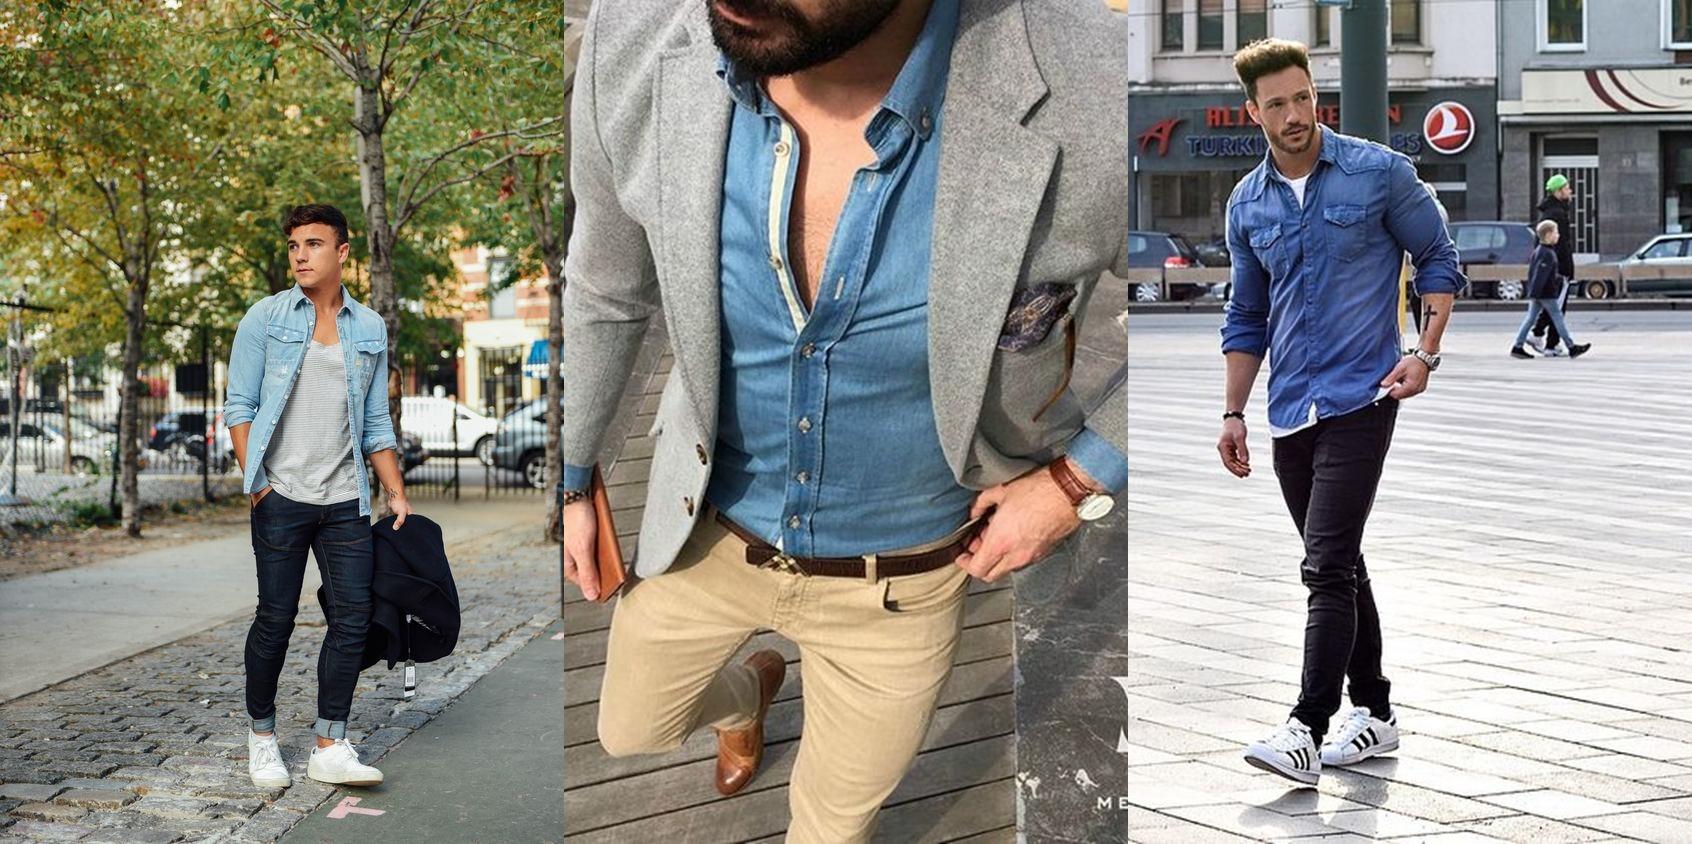 camisa-jeans-masculina-dicas-de-moda-dicas-de-estilo-moda-masculina-como-ser-estiloso-como-ter-estilo-alex-cursino-moda-sem-censura-blog-de-moda-digital-influencer-social-media